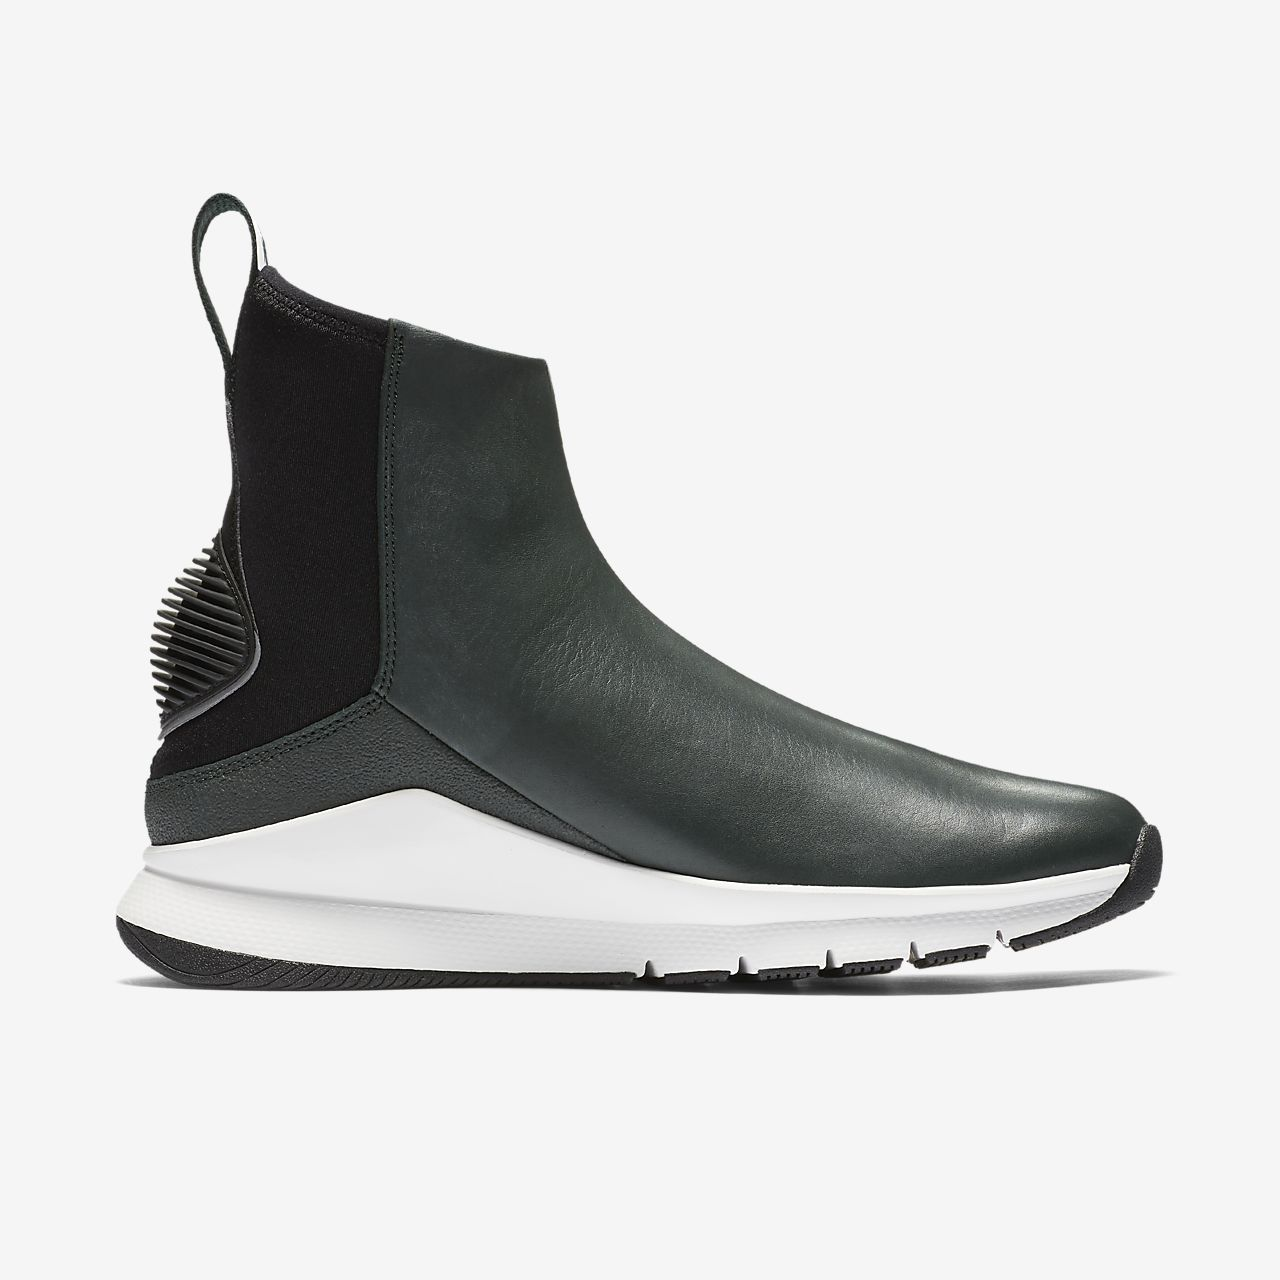 Nike Women's Rivah Hi Premium Black White Silver Waterproof Size 6 AA1112-001